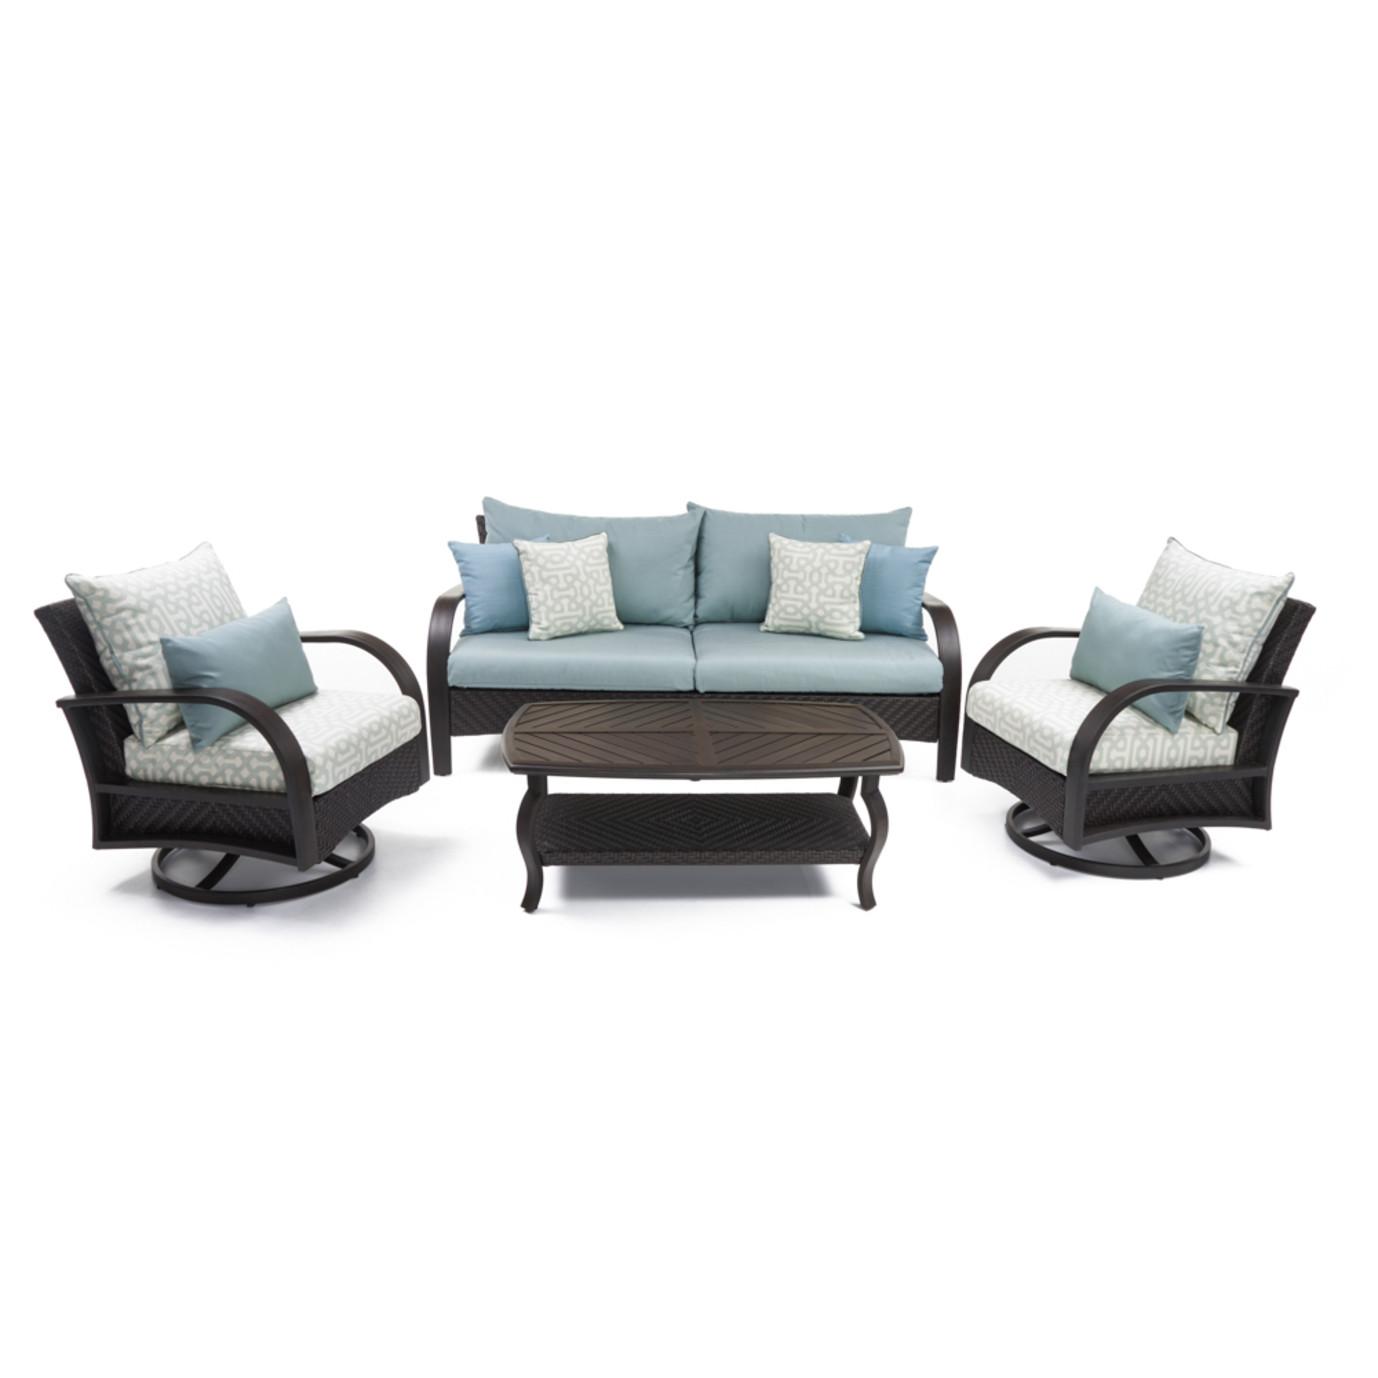 Barcelo™ 4pc Deluxe Motion Club & Sofa Set - Spa Blue Design